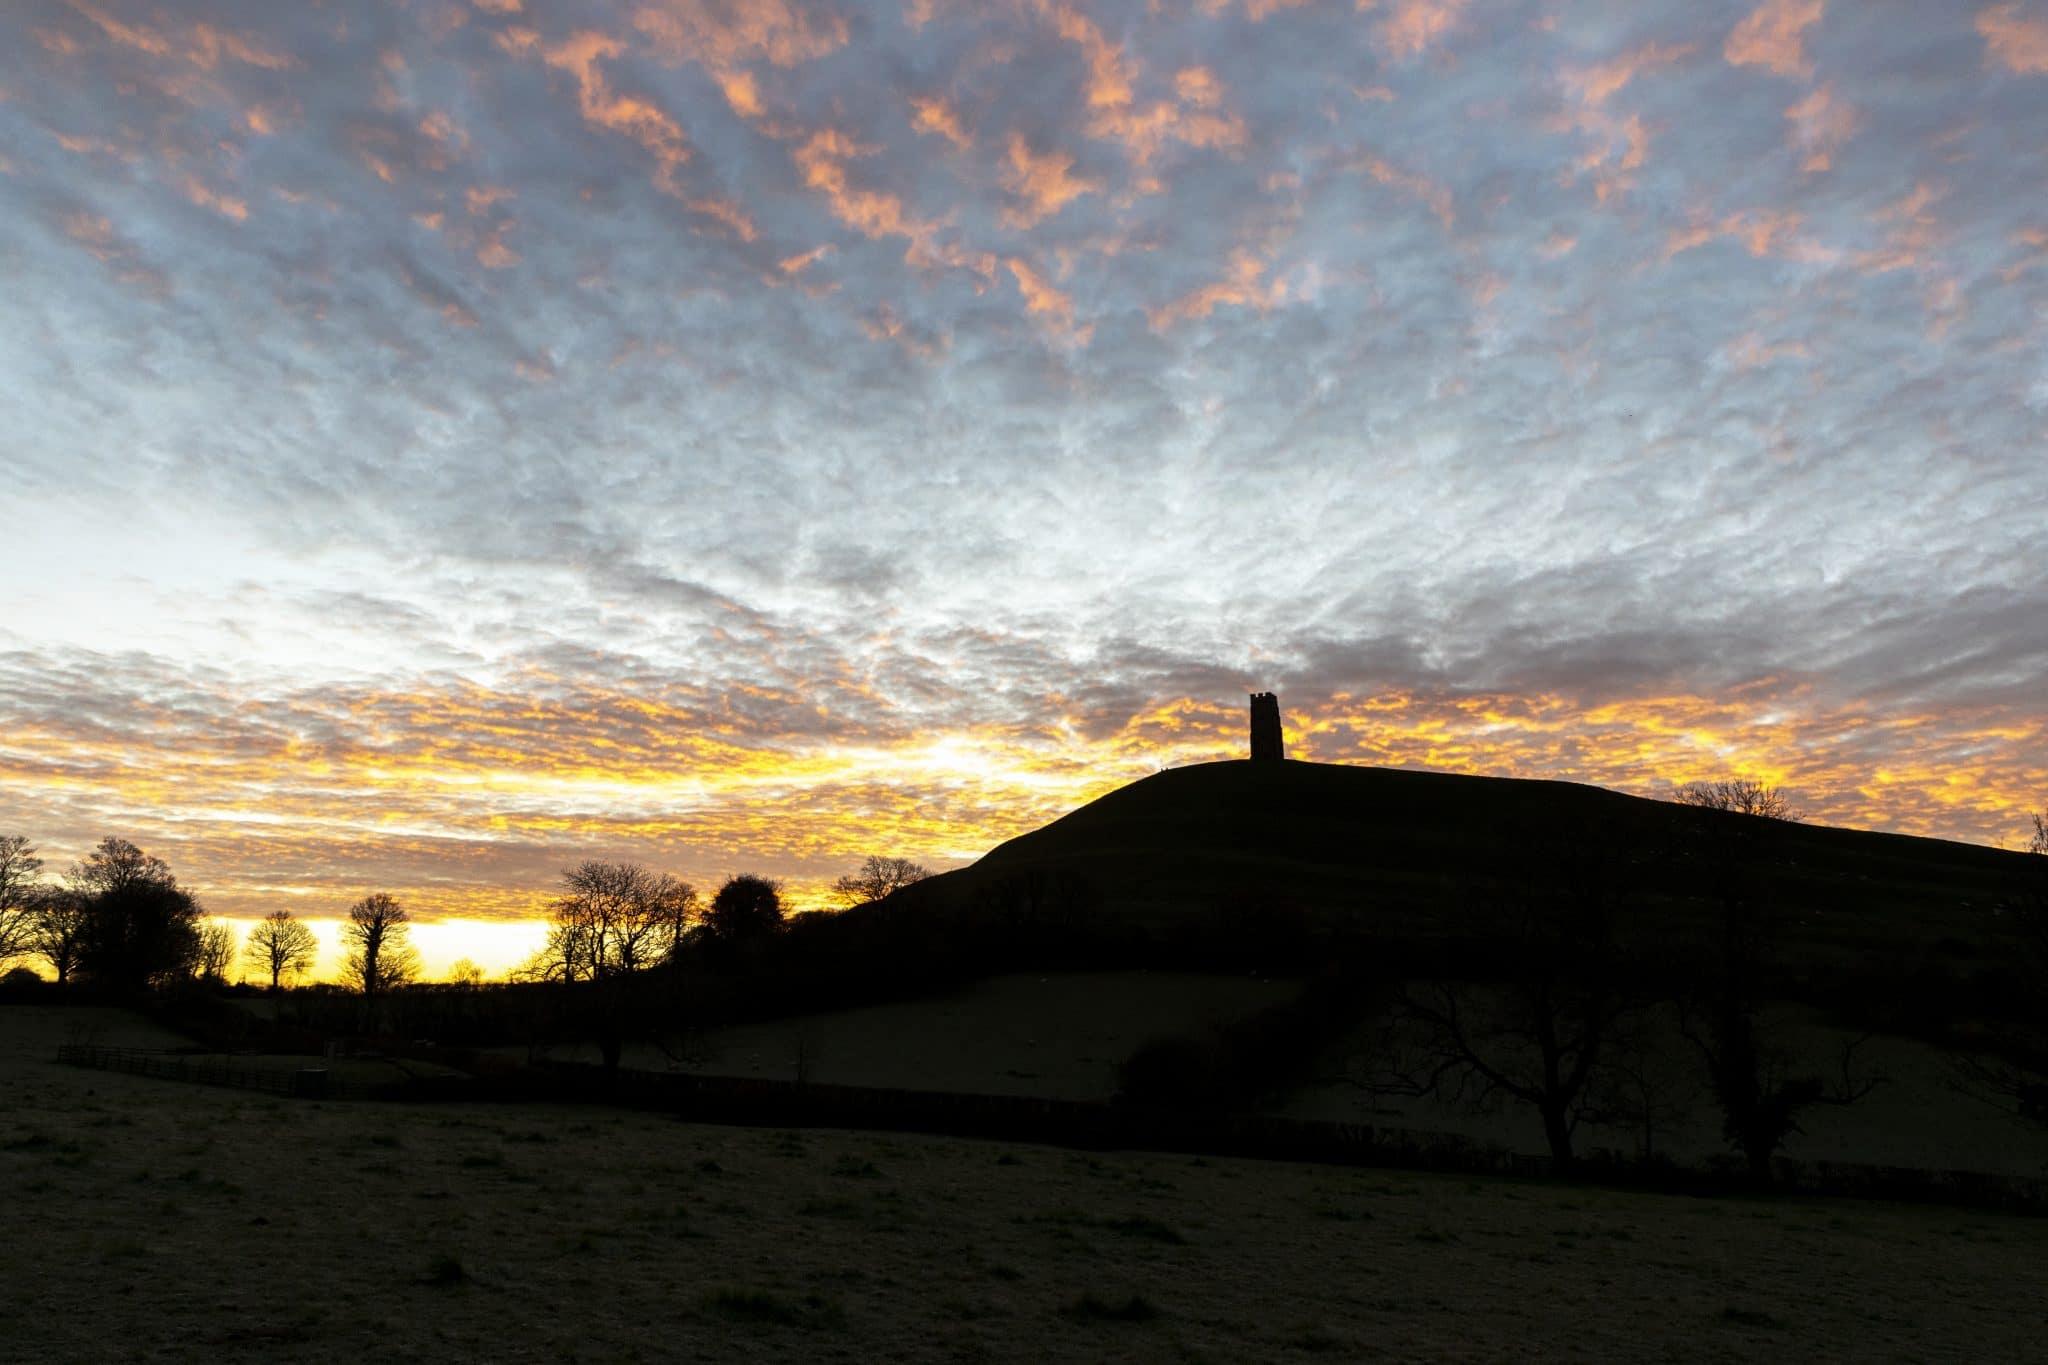 Herald of Dawn by Peter Longden